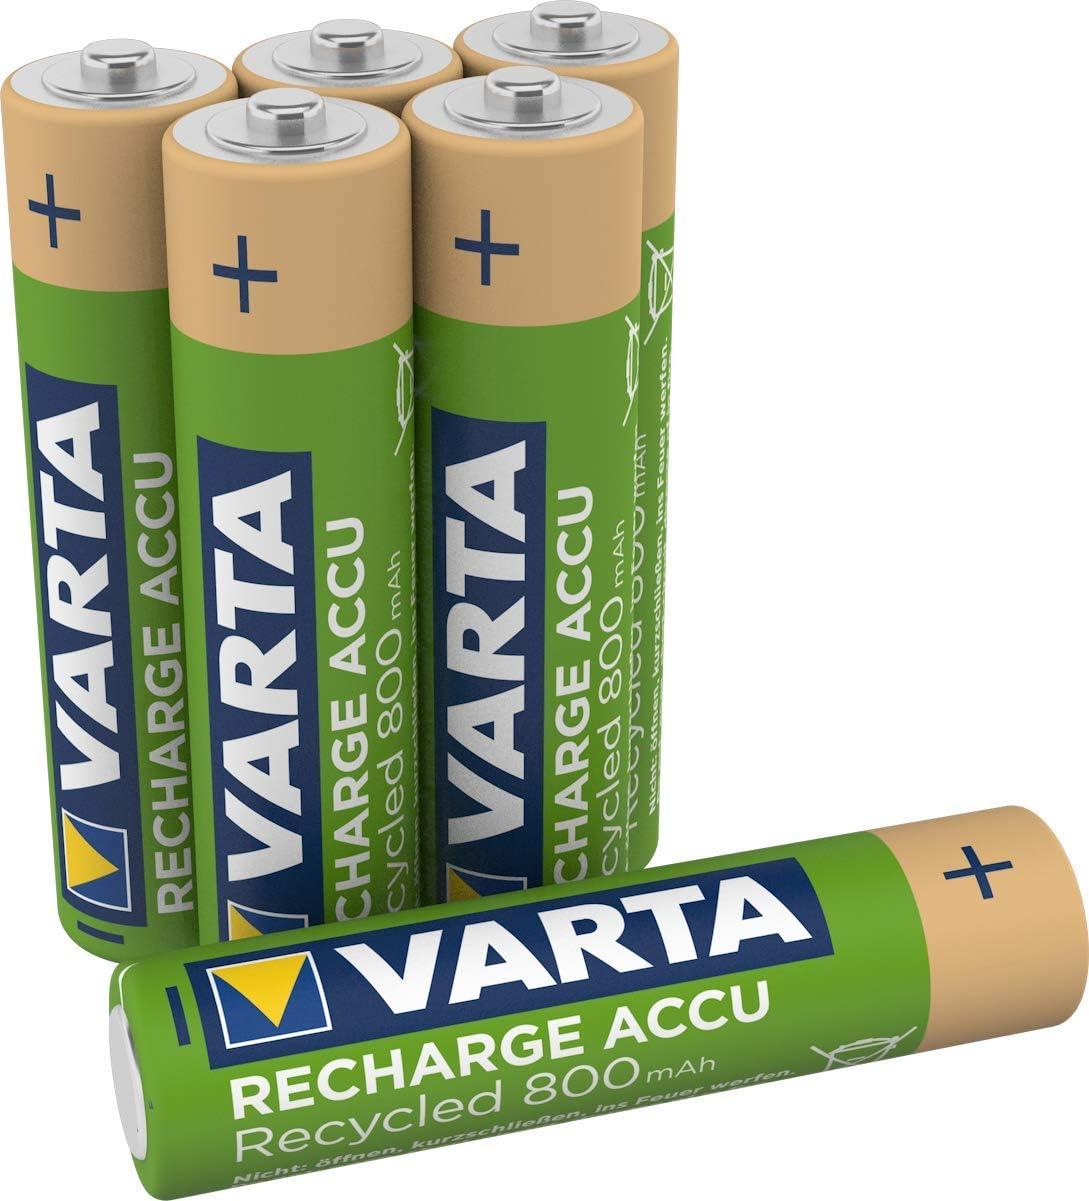 VARTA Recharge Accu Recycled, Pilas de NiMh AAA Micro rechargable (paquete de 6 unidades, 800 mAh) hechas con un 11% de materiales reciclados - Recargables sin efecto de memoria